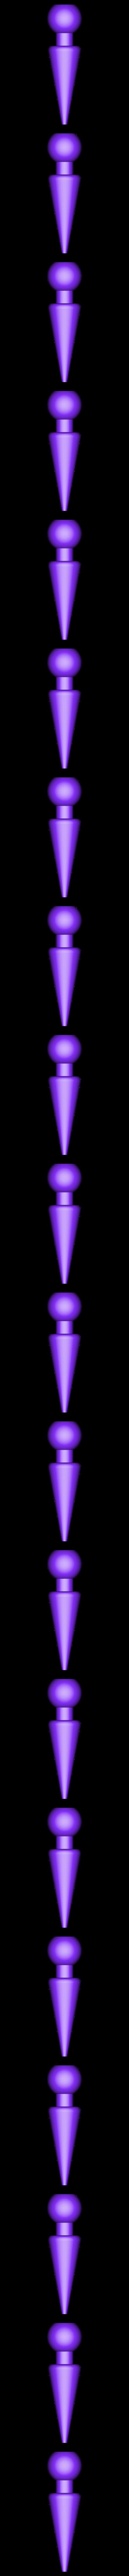 ball_spike.stl Download free STL file ChainClip. Robocreatures parts • 3D print object, ferjerez3d